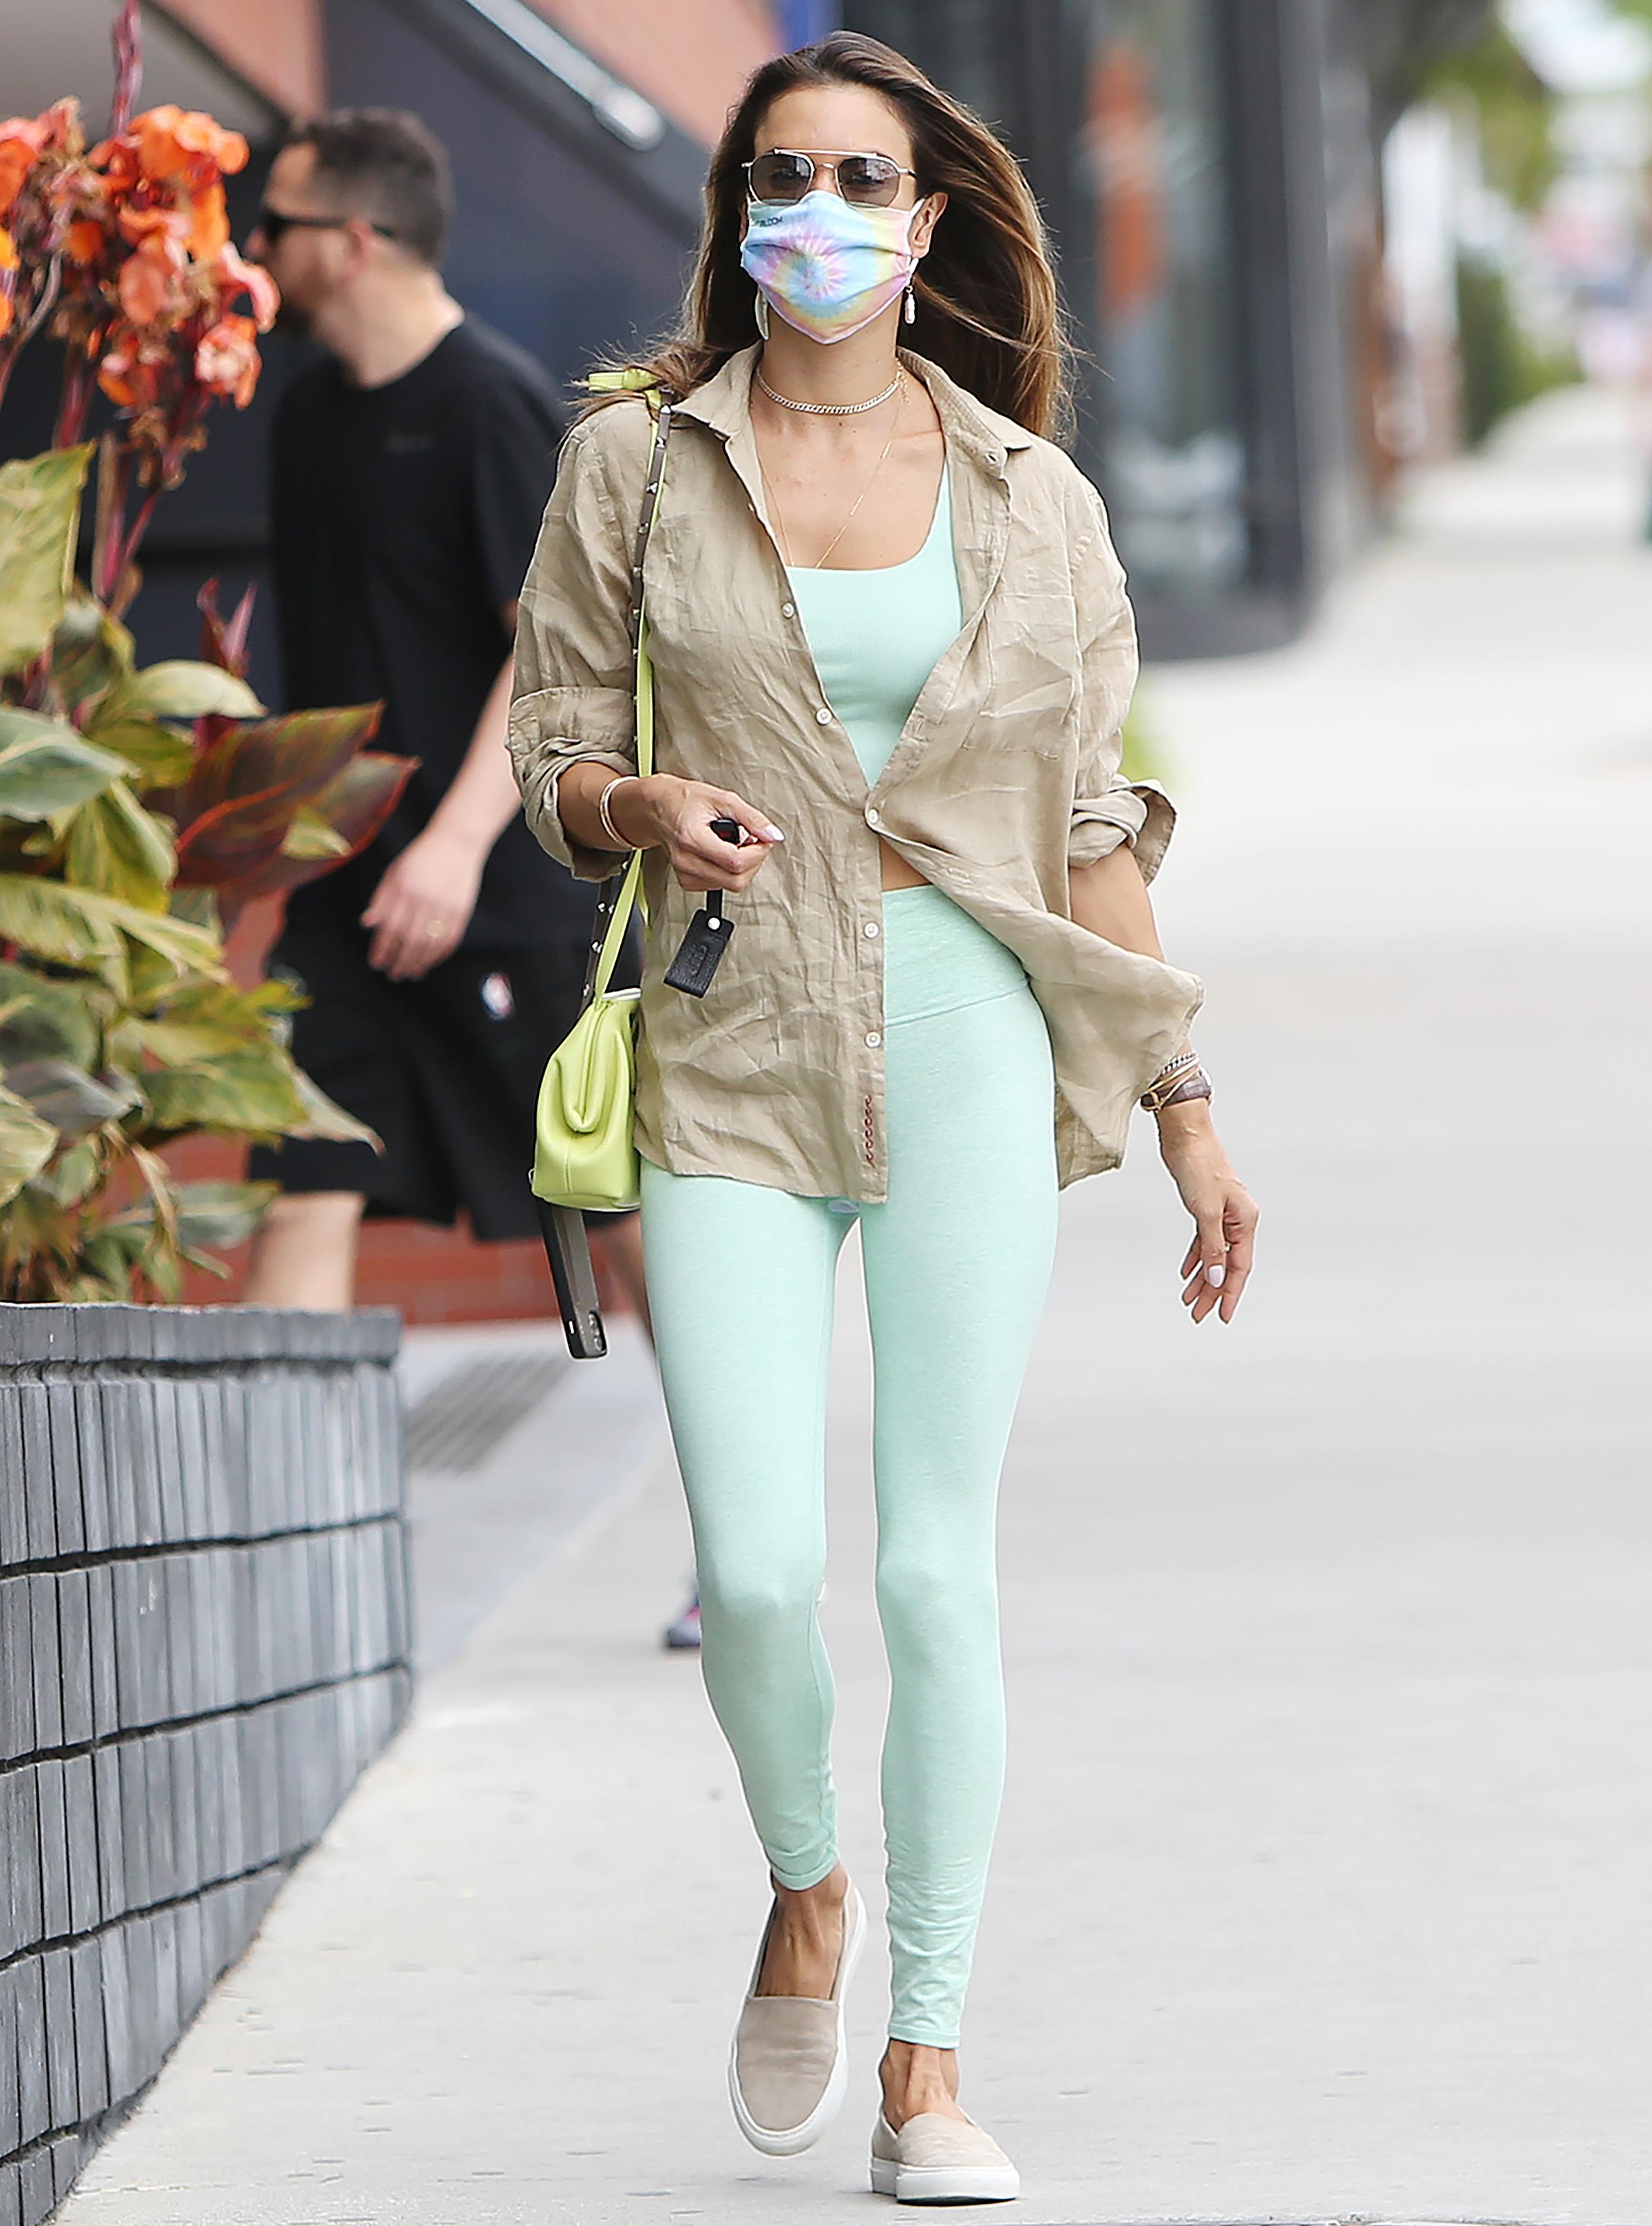 Alessandra Ambrosio spotted in green leggings as she run errands in Santa Monica. 01 Apr 2021 Pictured: Alessandra Ambrosio. Photo credit: CrownMedia/MEGA TheMegaAgency.com +1 888 505 6342 (Mega Agency TagID: MEGA743894_004.jpg) [Photo via Mega Agency]